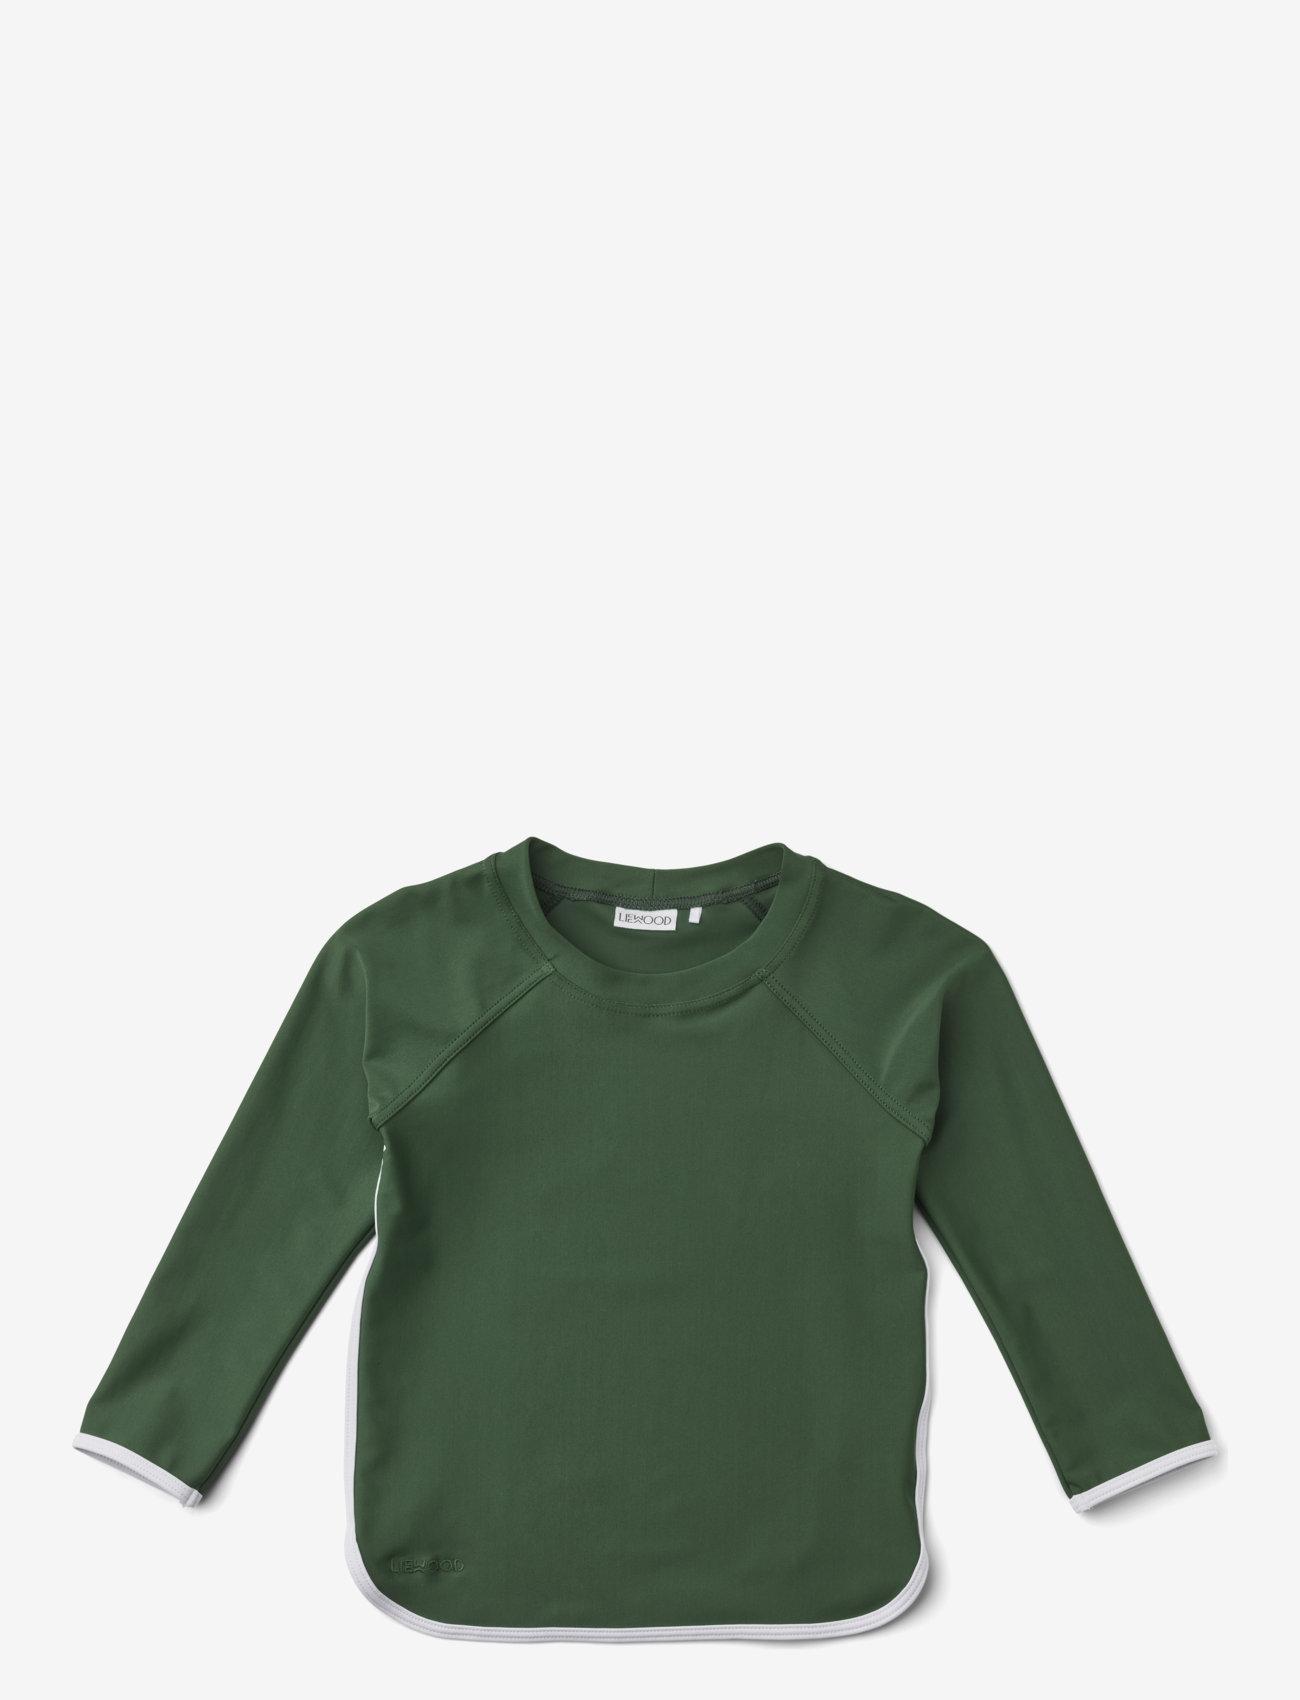 Liewood - Manta swim tee - uv-clothing - garden green - 0